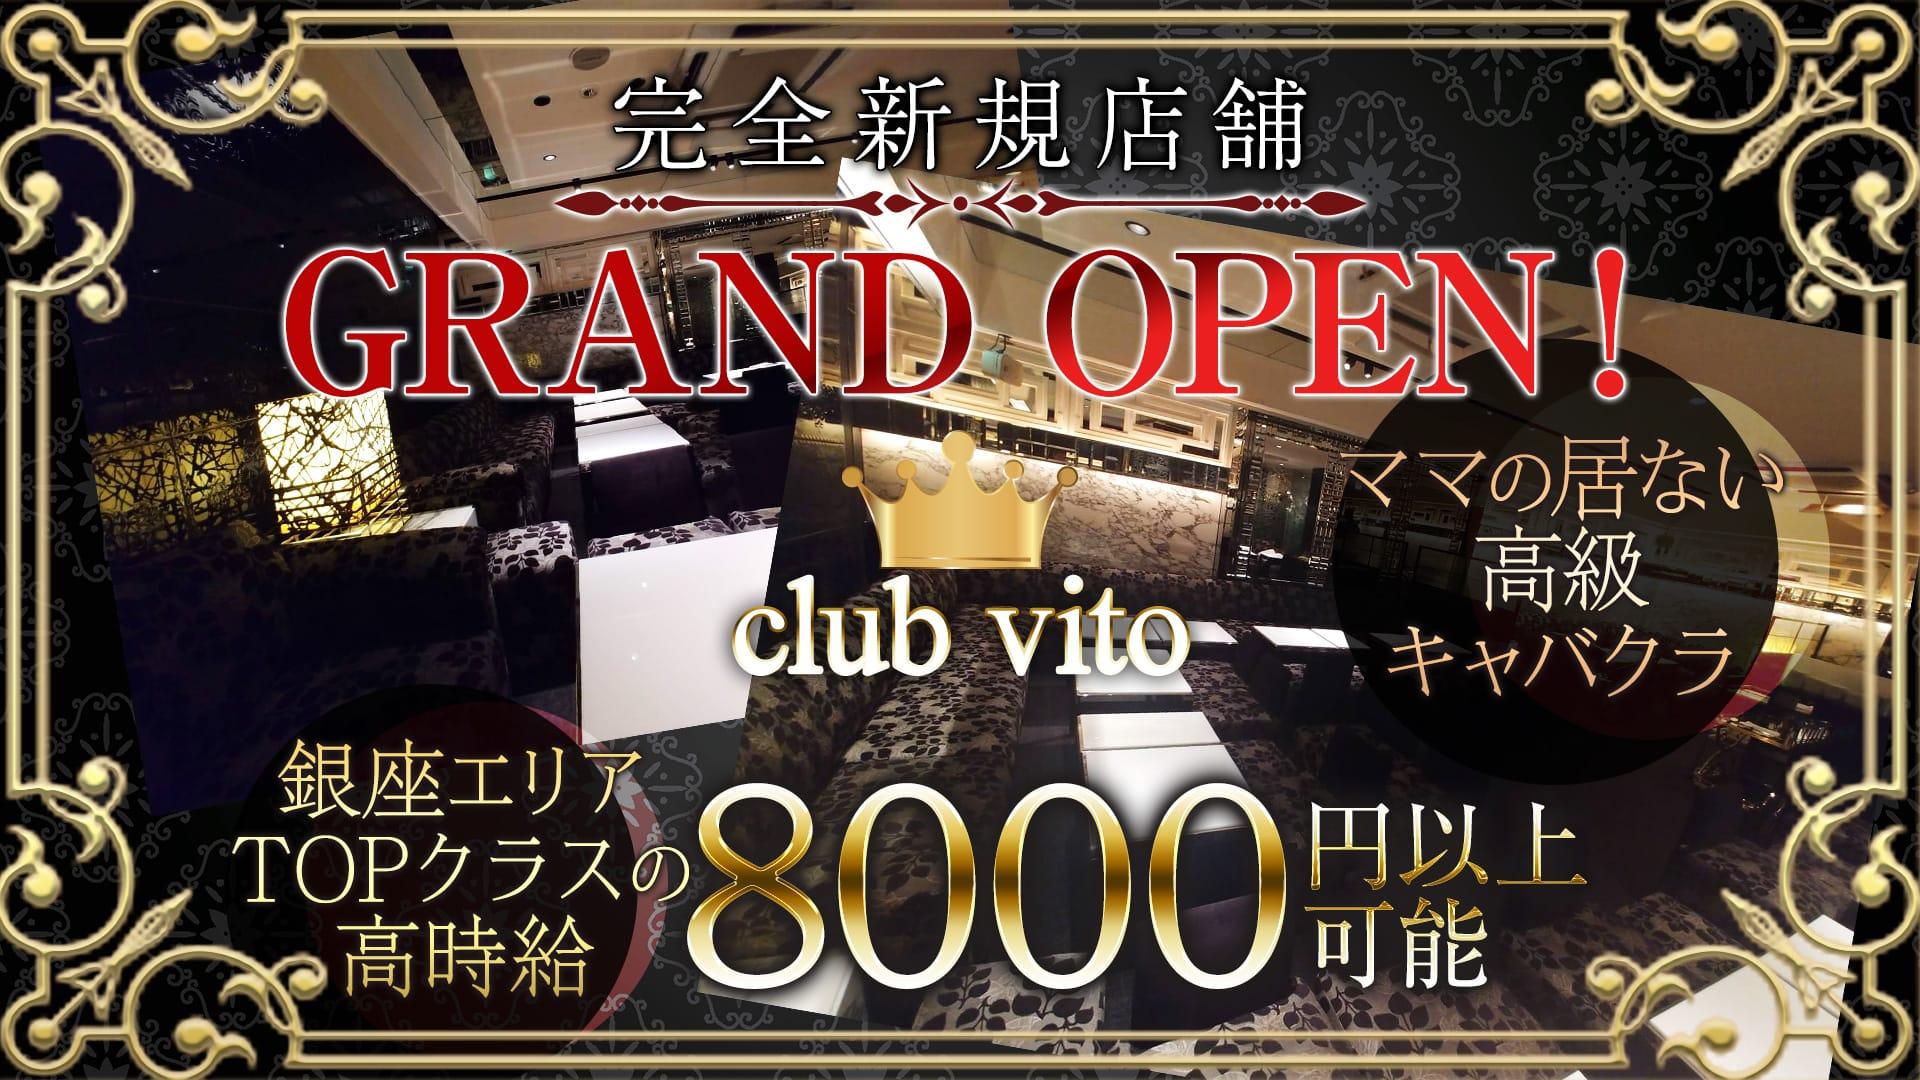 club vito(ビト)【公式求人・体入情報】 銀座キャバクラ TOP画像